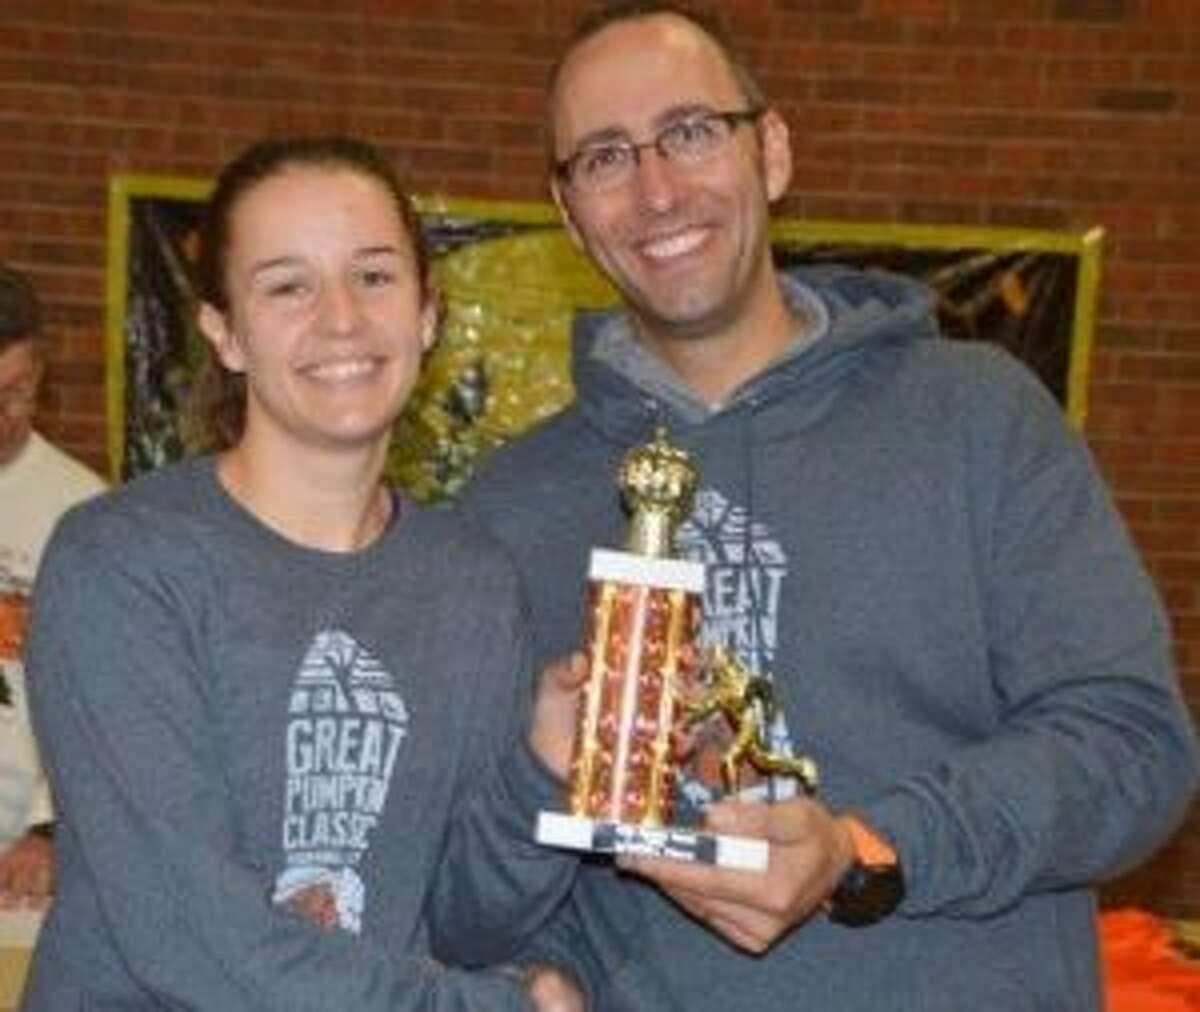 Katelynn Romanchick and Michael John DeMartin placed first at the Great Pumpkin Classic 5K.